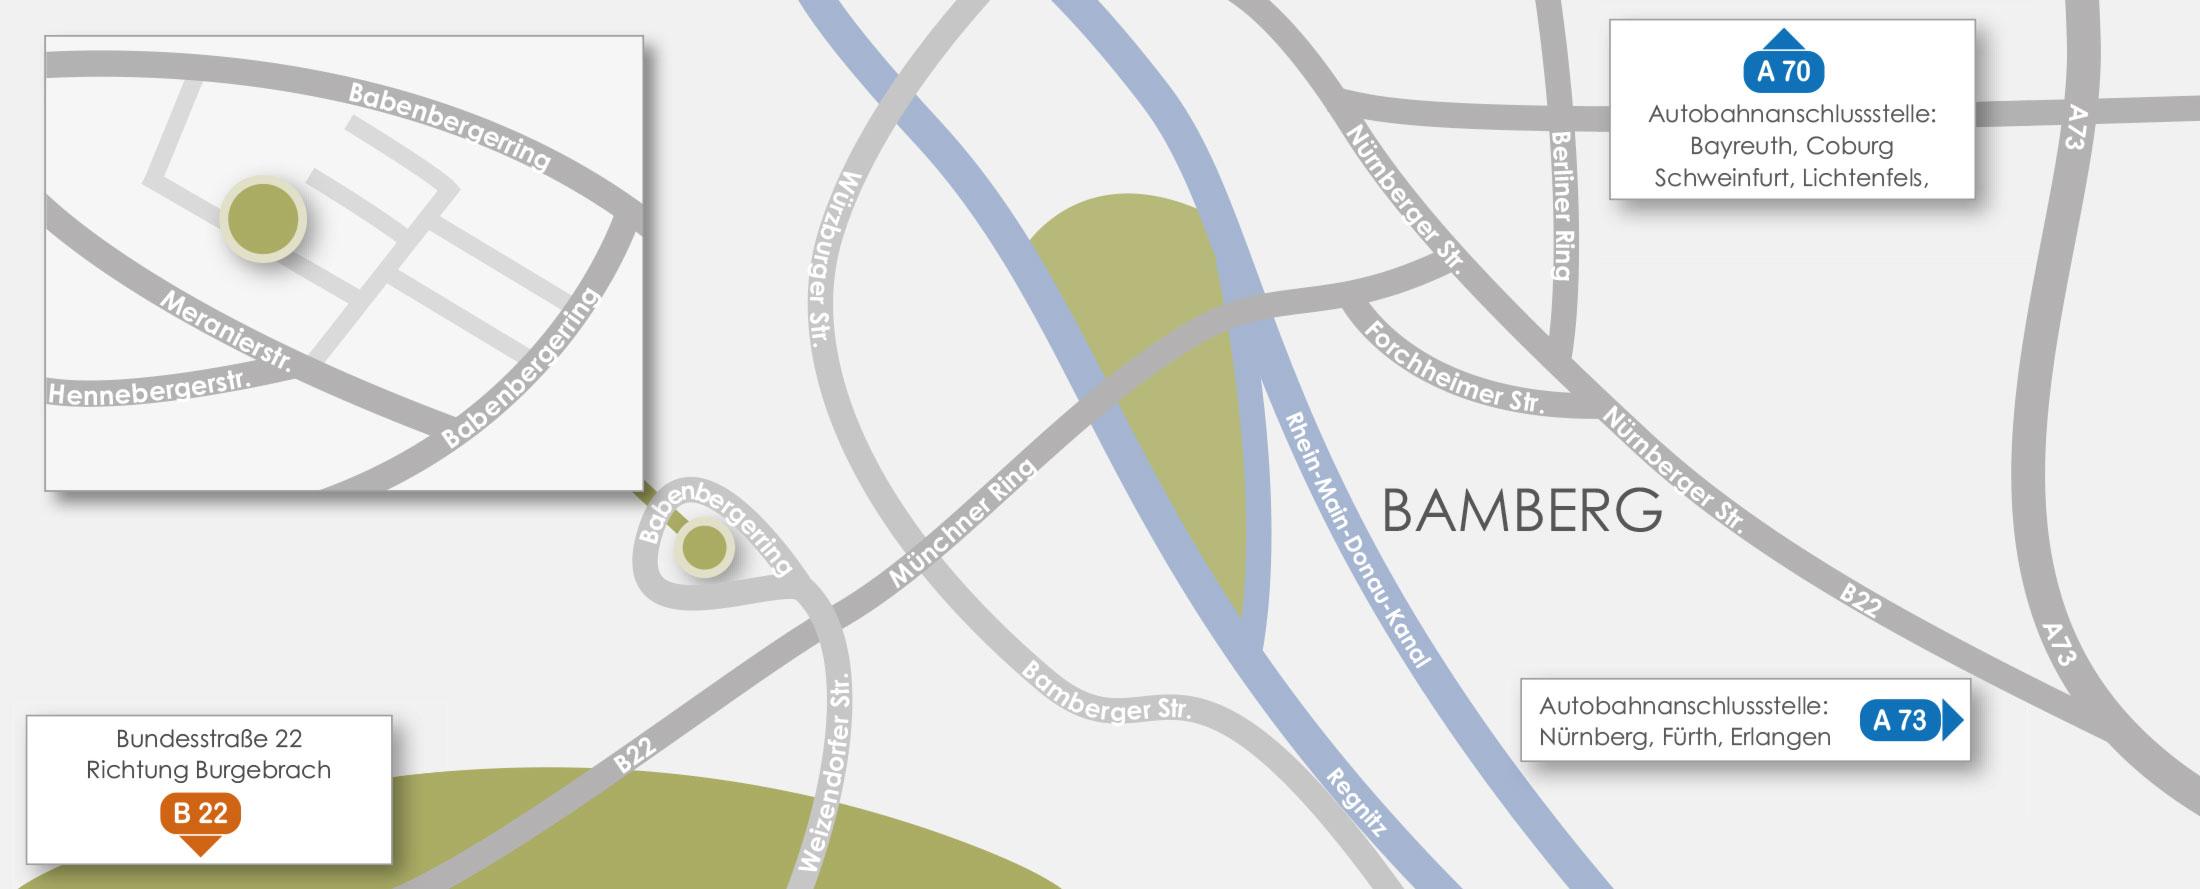 Ingenieurbüro Bräuning + Partner mbB